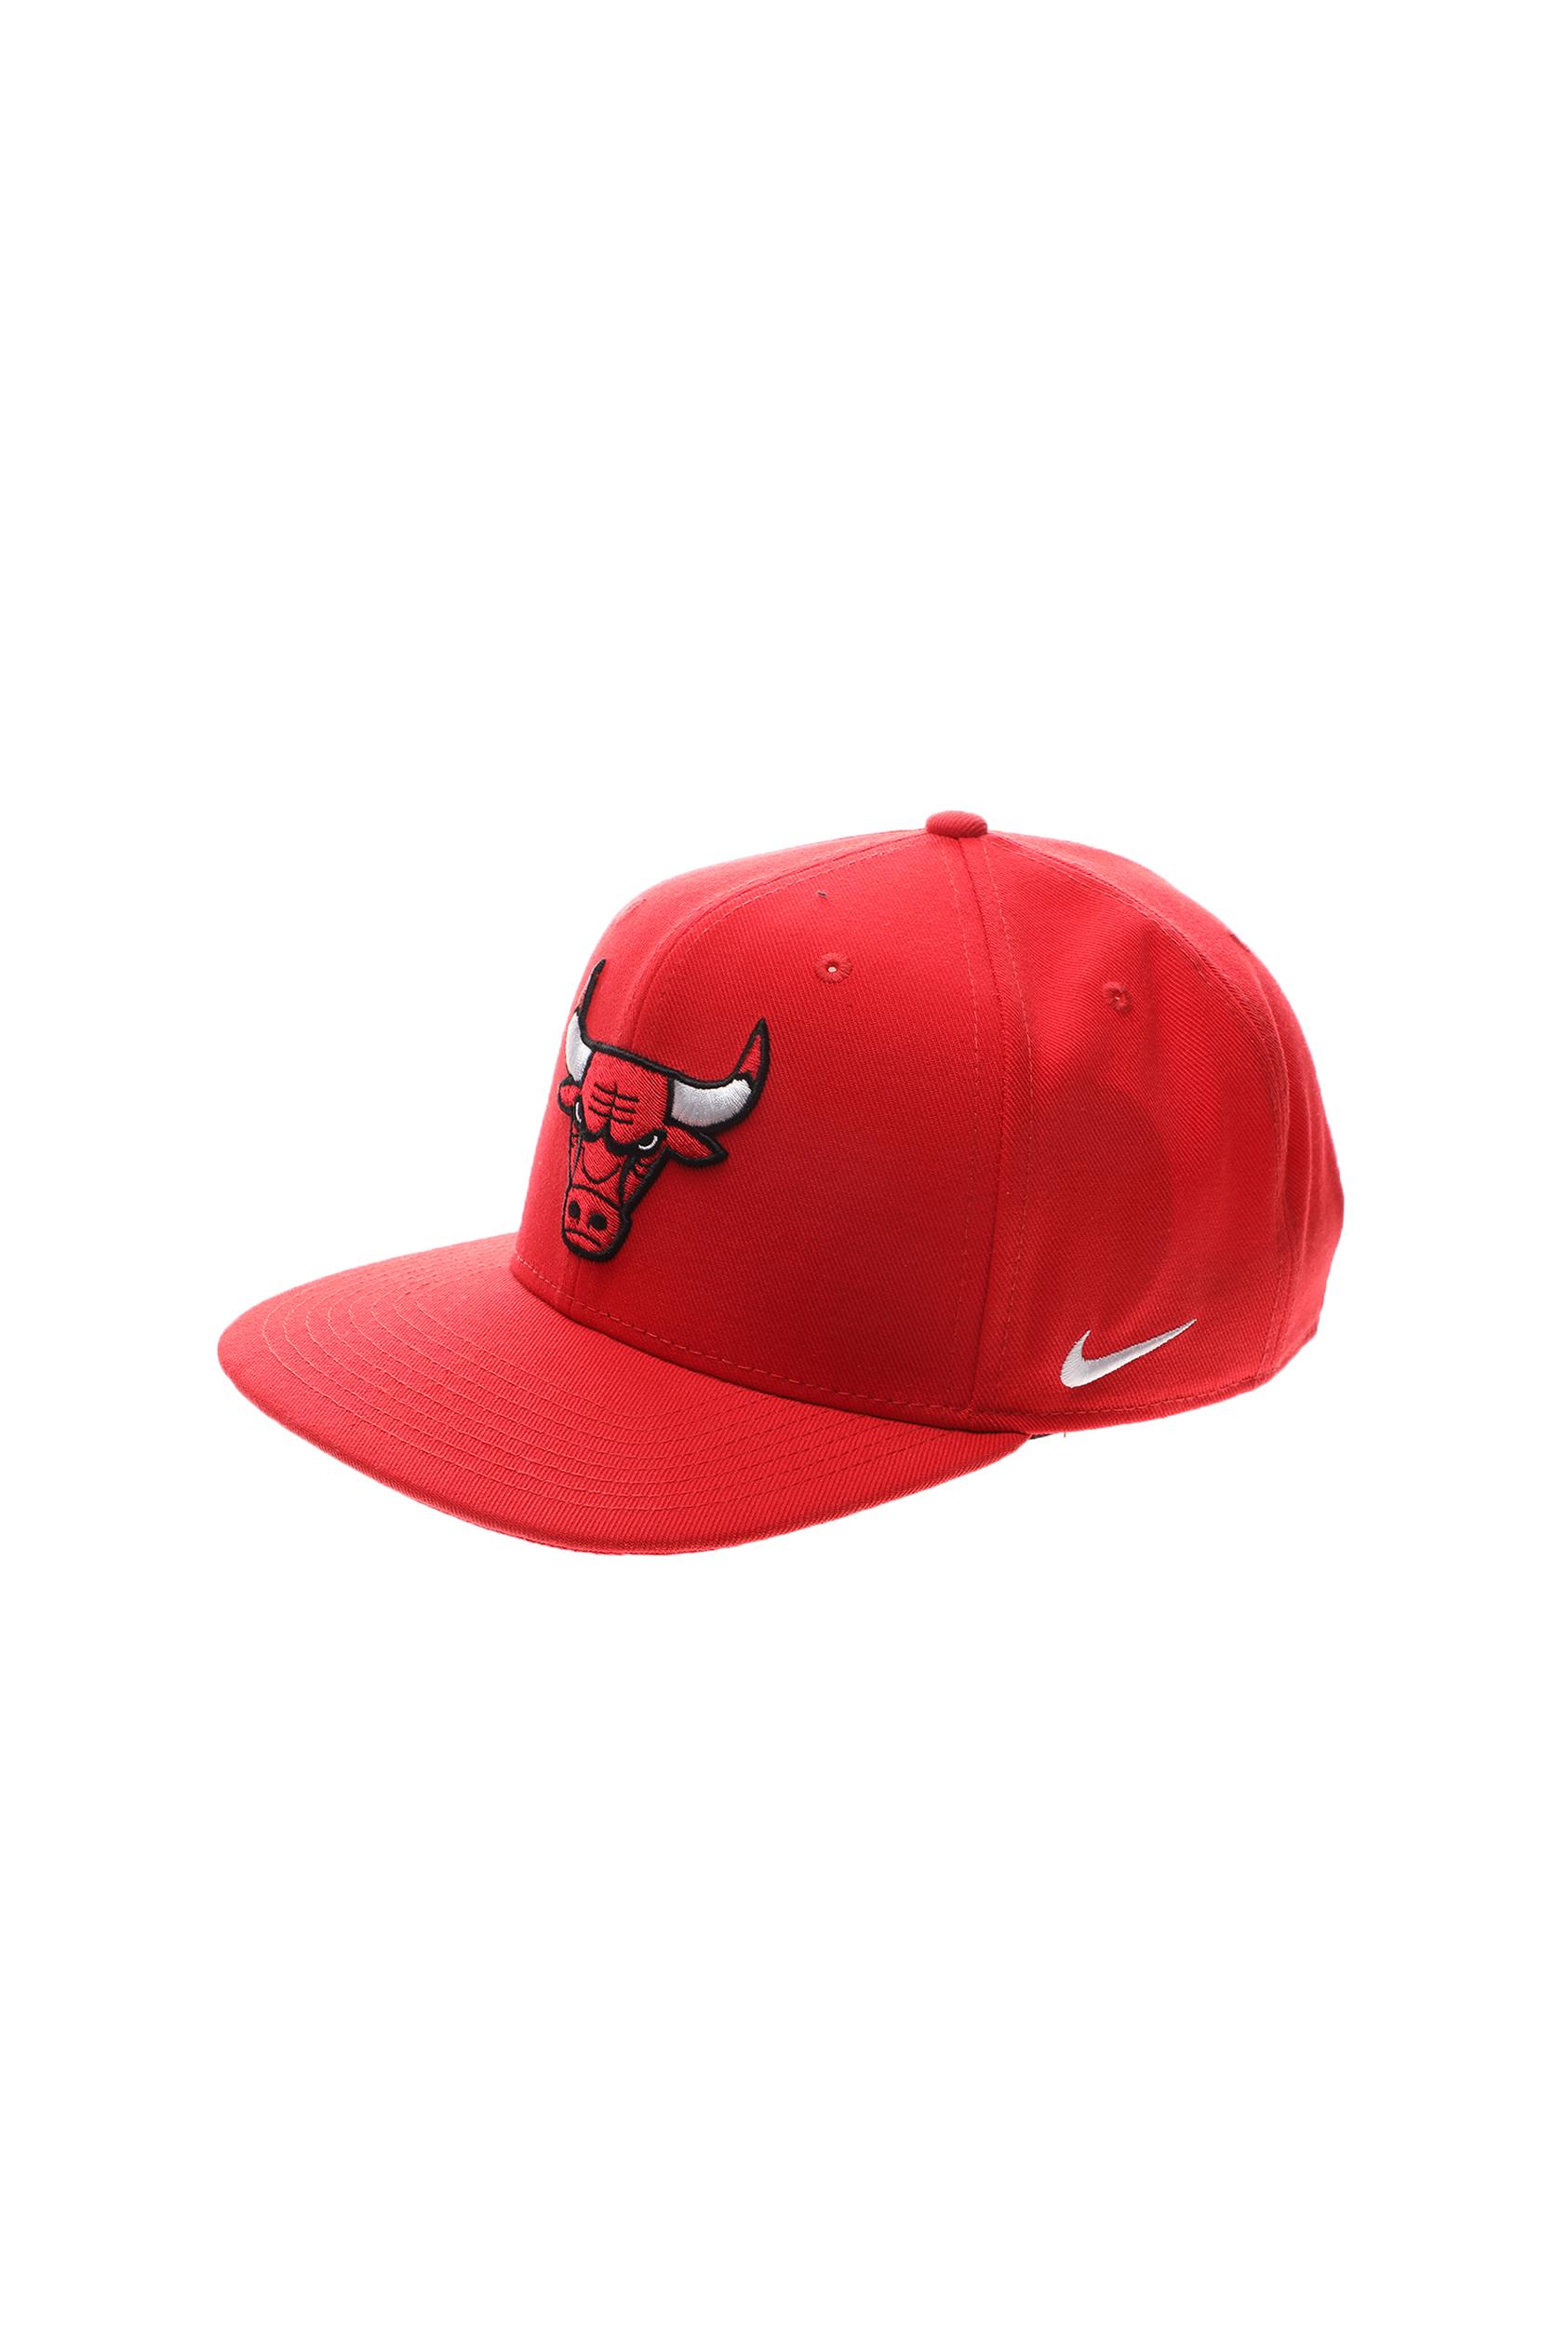 NIKE - Αθλητικό καπέλο NIKE ΝΒΑ CHI NBA U NK PRO ADJ LOGO κόκκινο